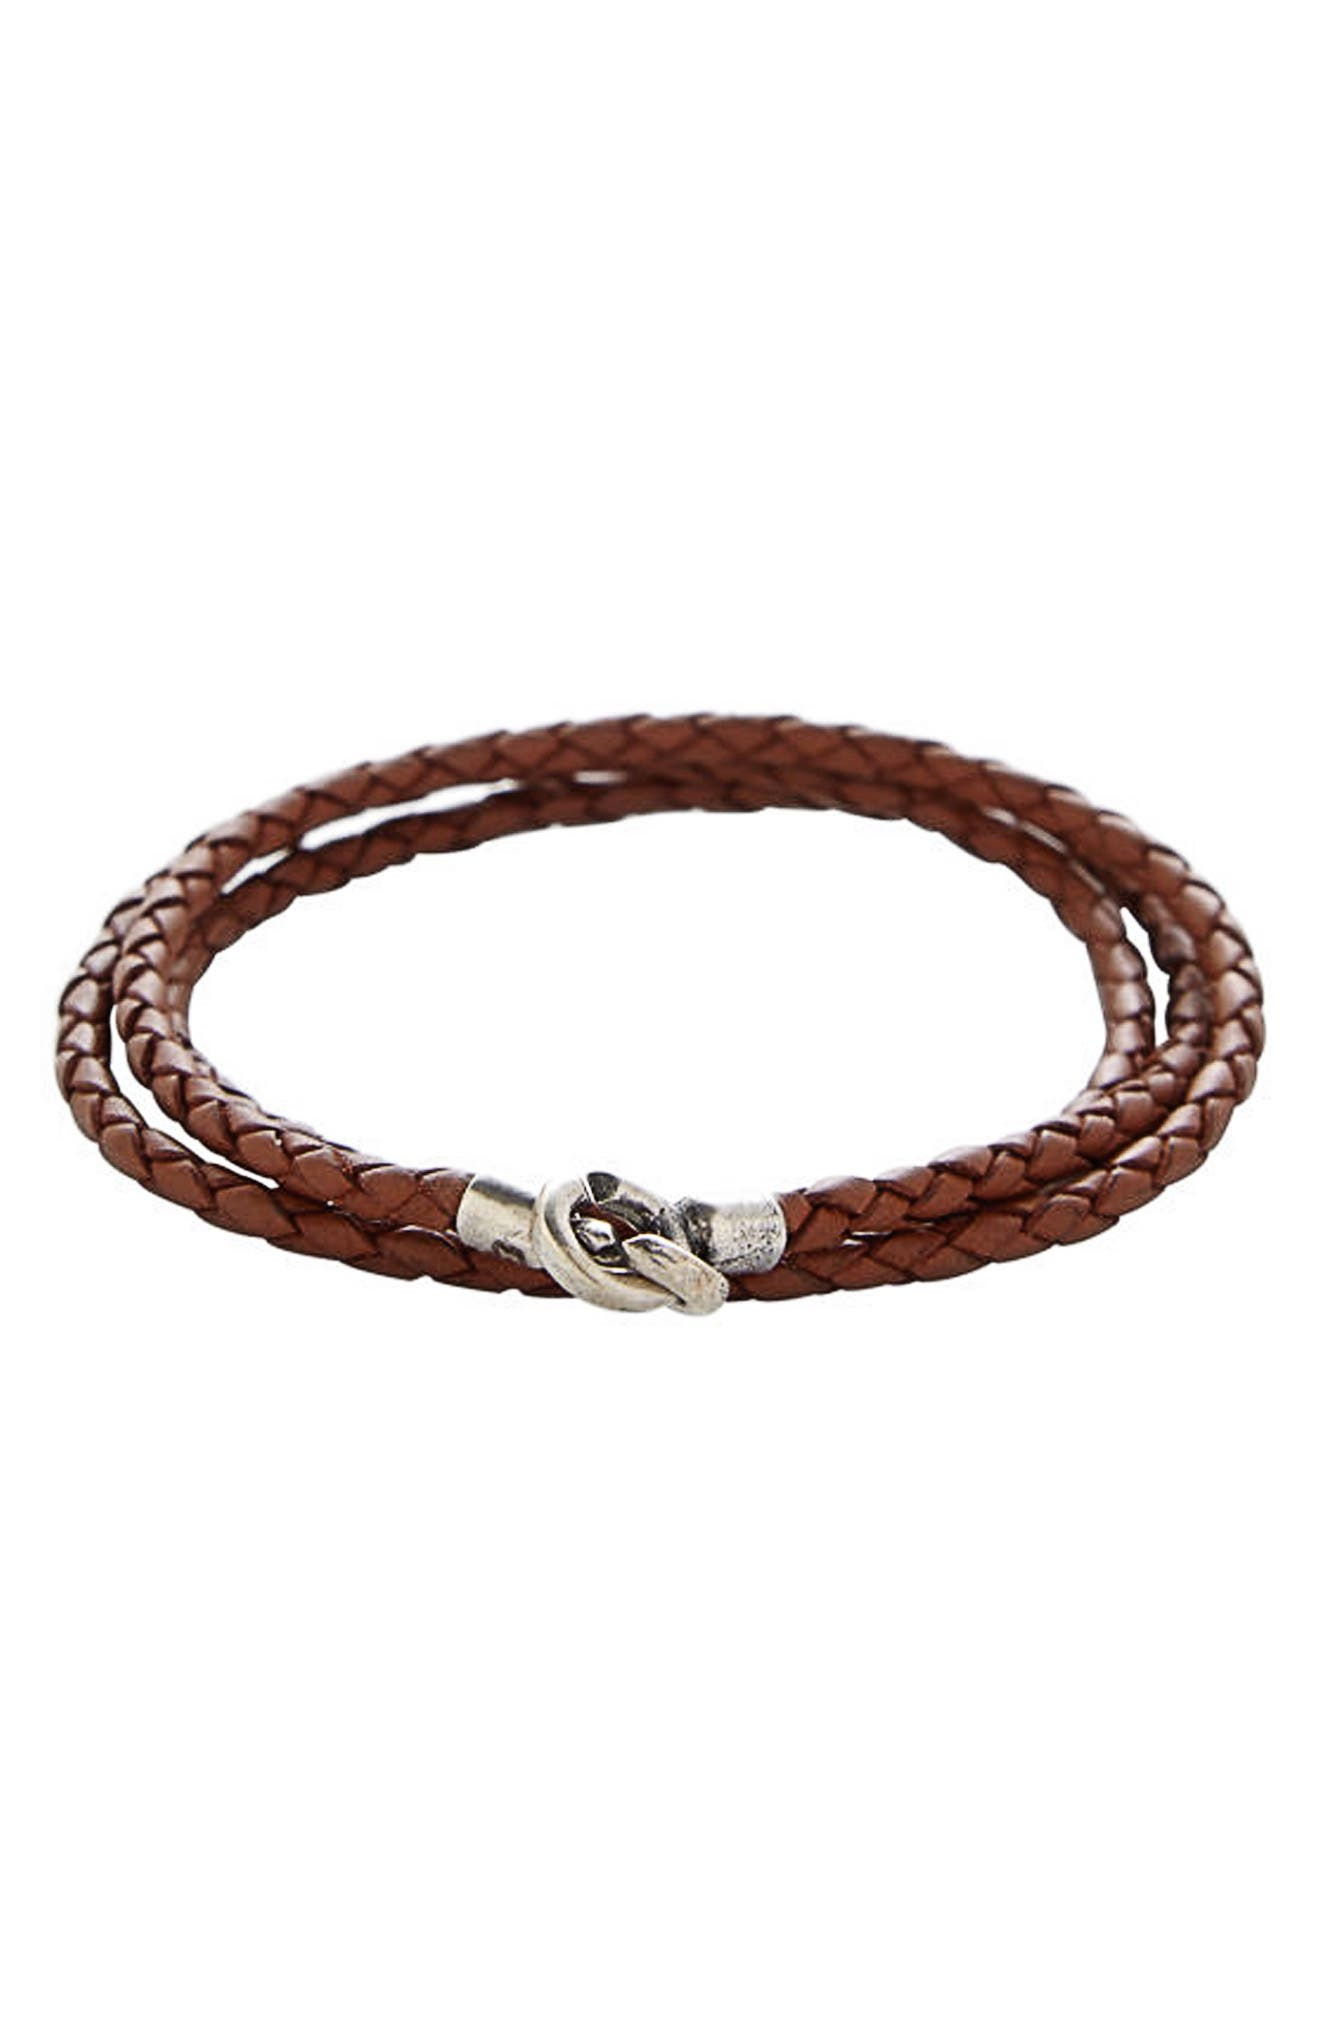 Leather Wrap Bracelet,                         Main,                         color, Saddle